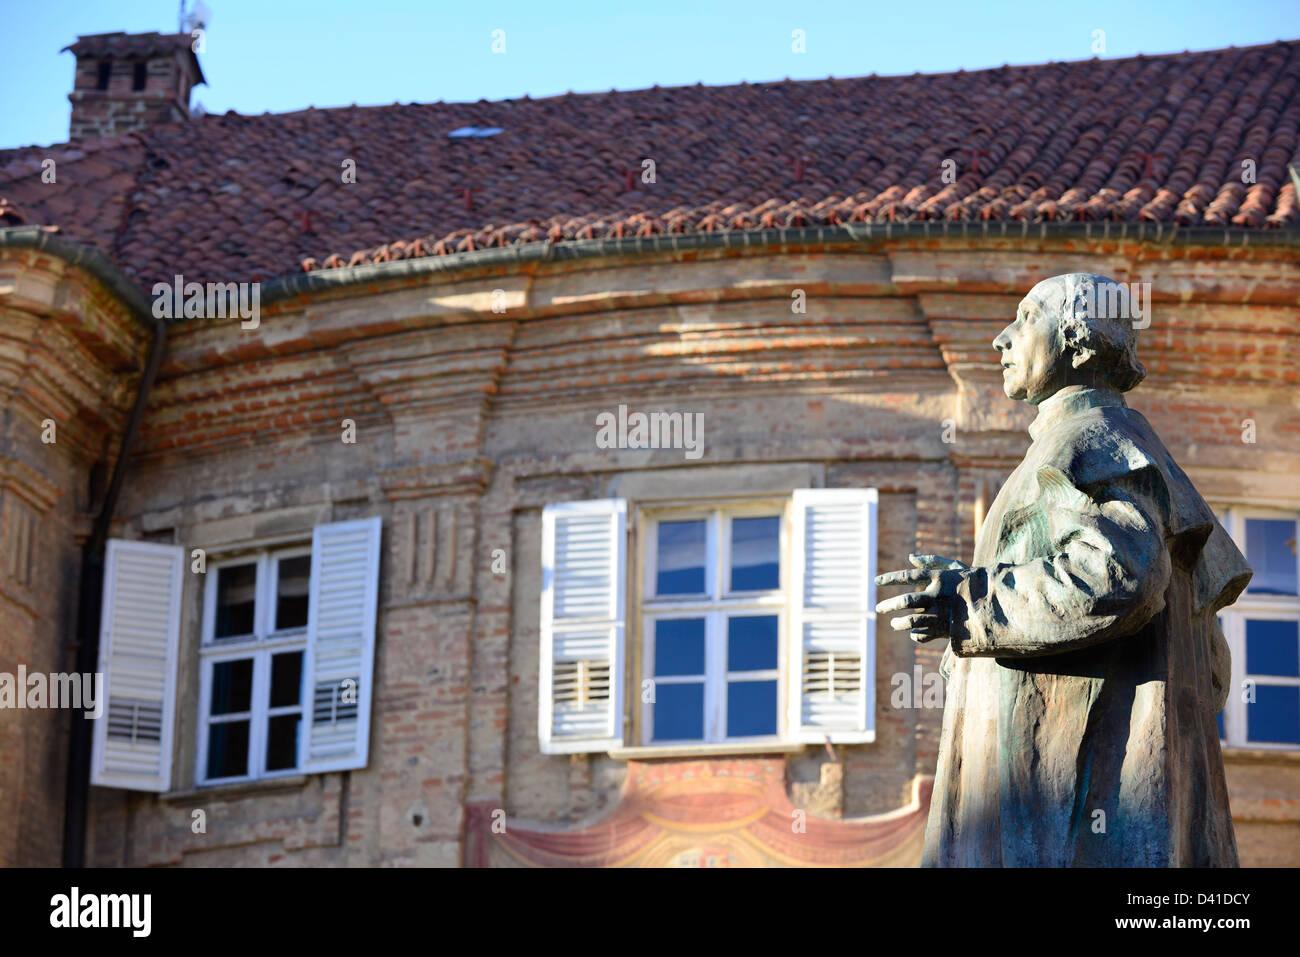 Bra municipality building in piazza caduti per la libertà. - Stock Image